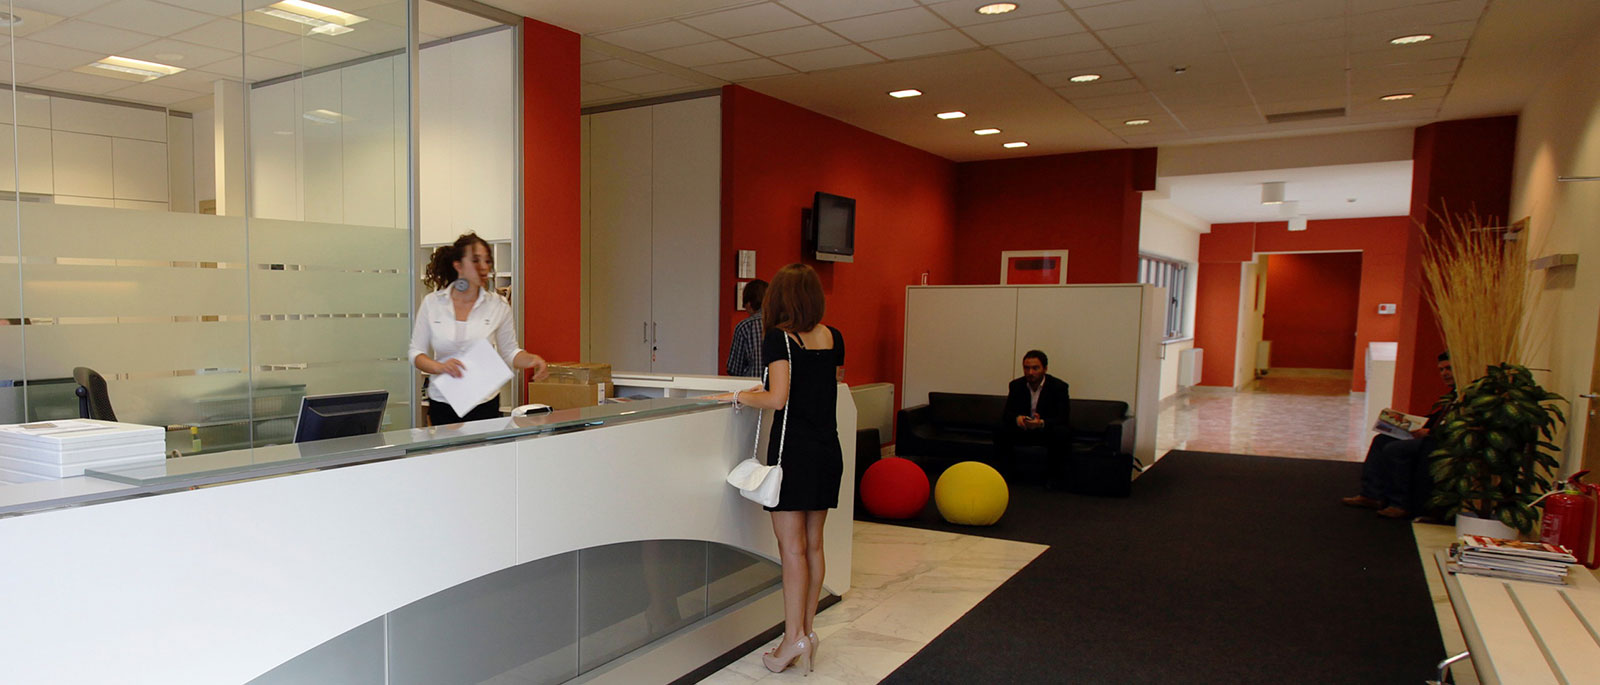 Reception-Eur-NEW-01 Pickcenter